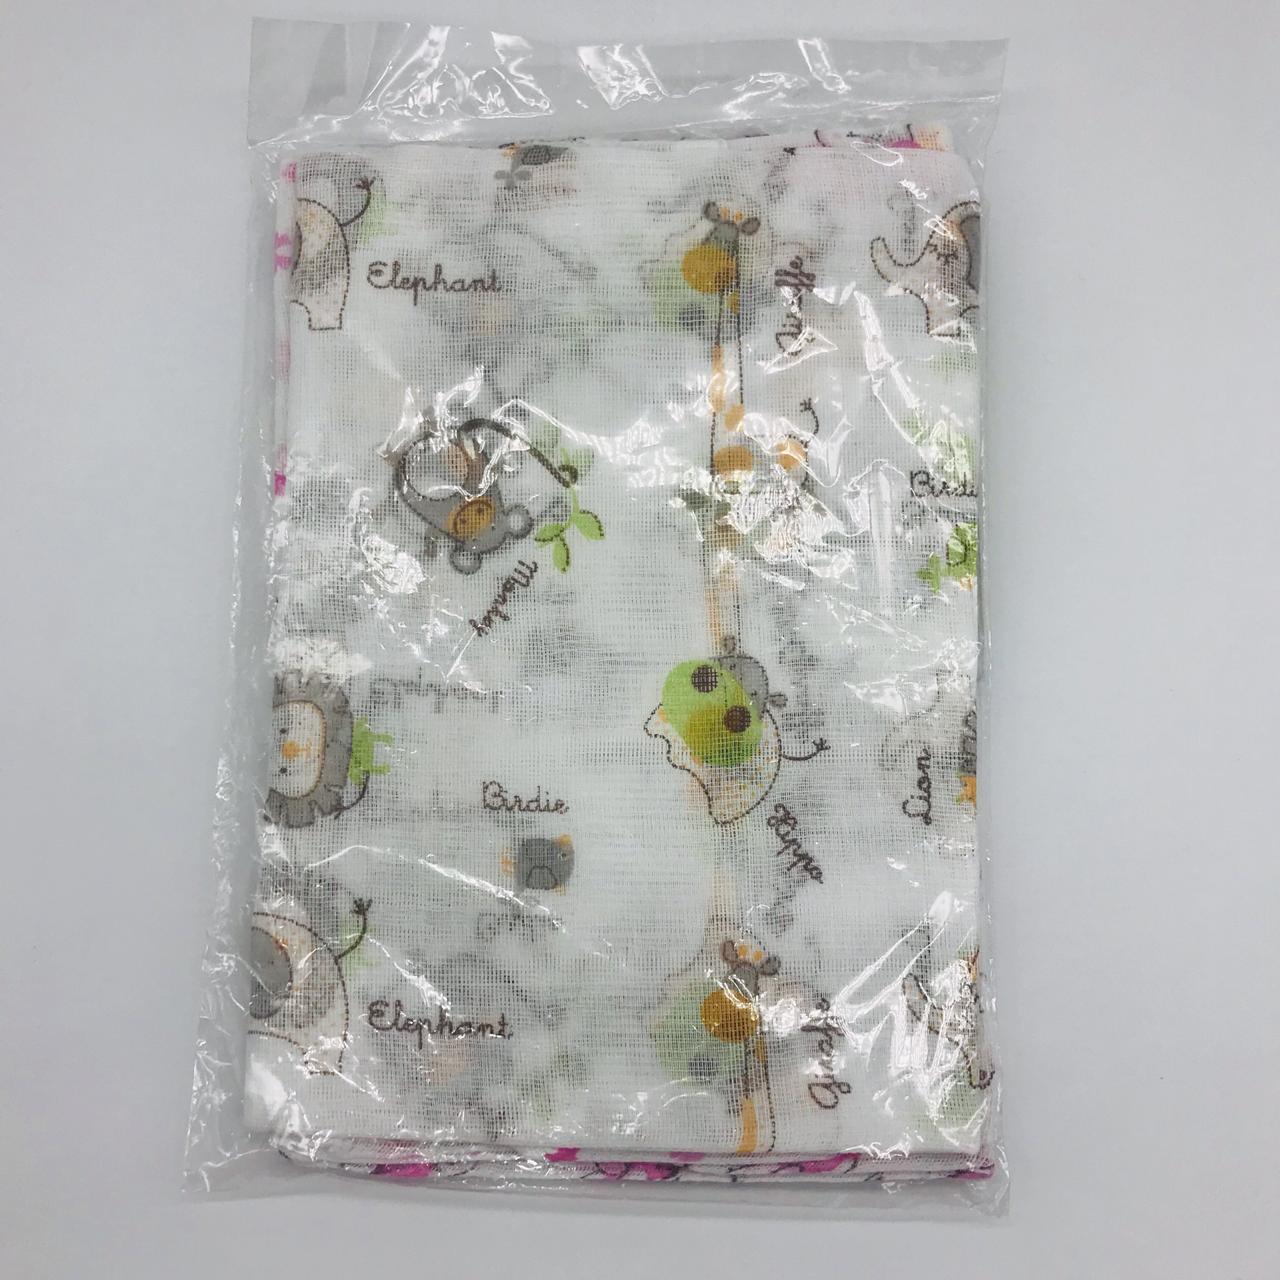 Toalha Fralda 65cm x 1,10cm 3 Und Com 2 Estampas - Parapipi Minasrey Ref 1040